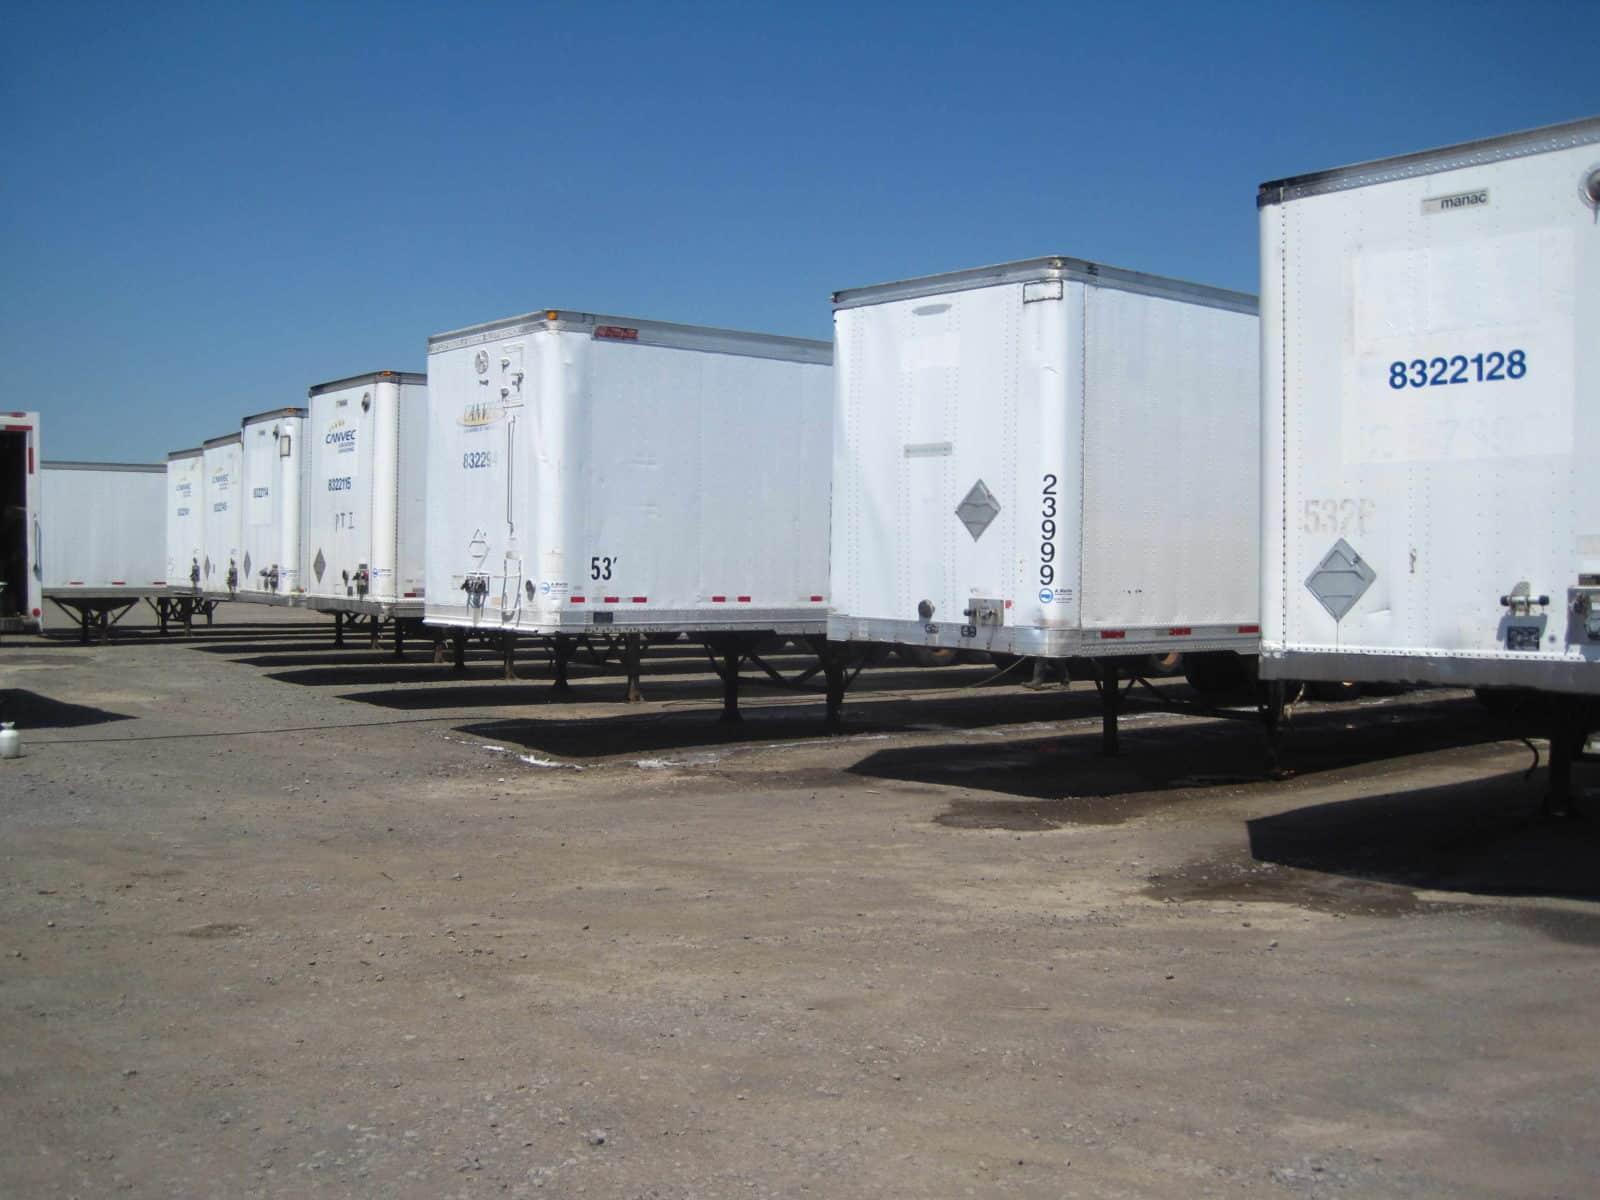 4-Remorque-entrepot-48-3-Storage-Trailerv2